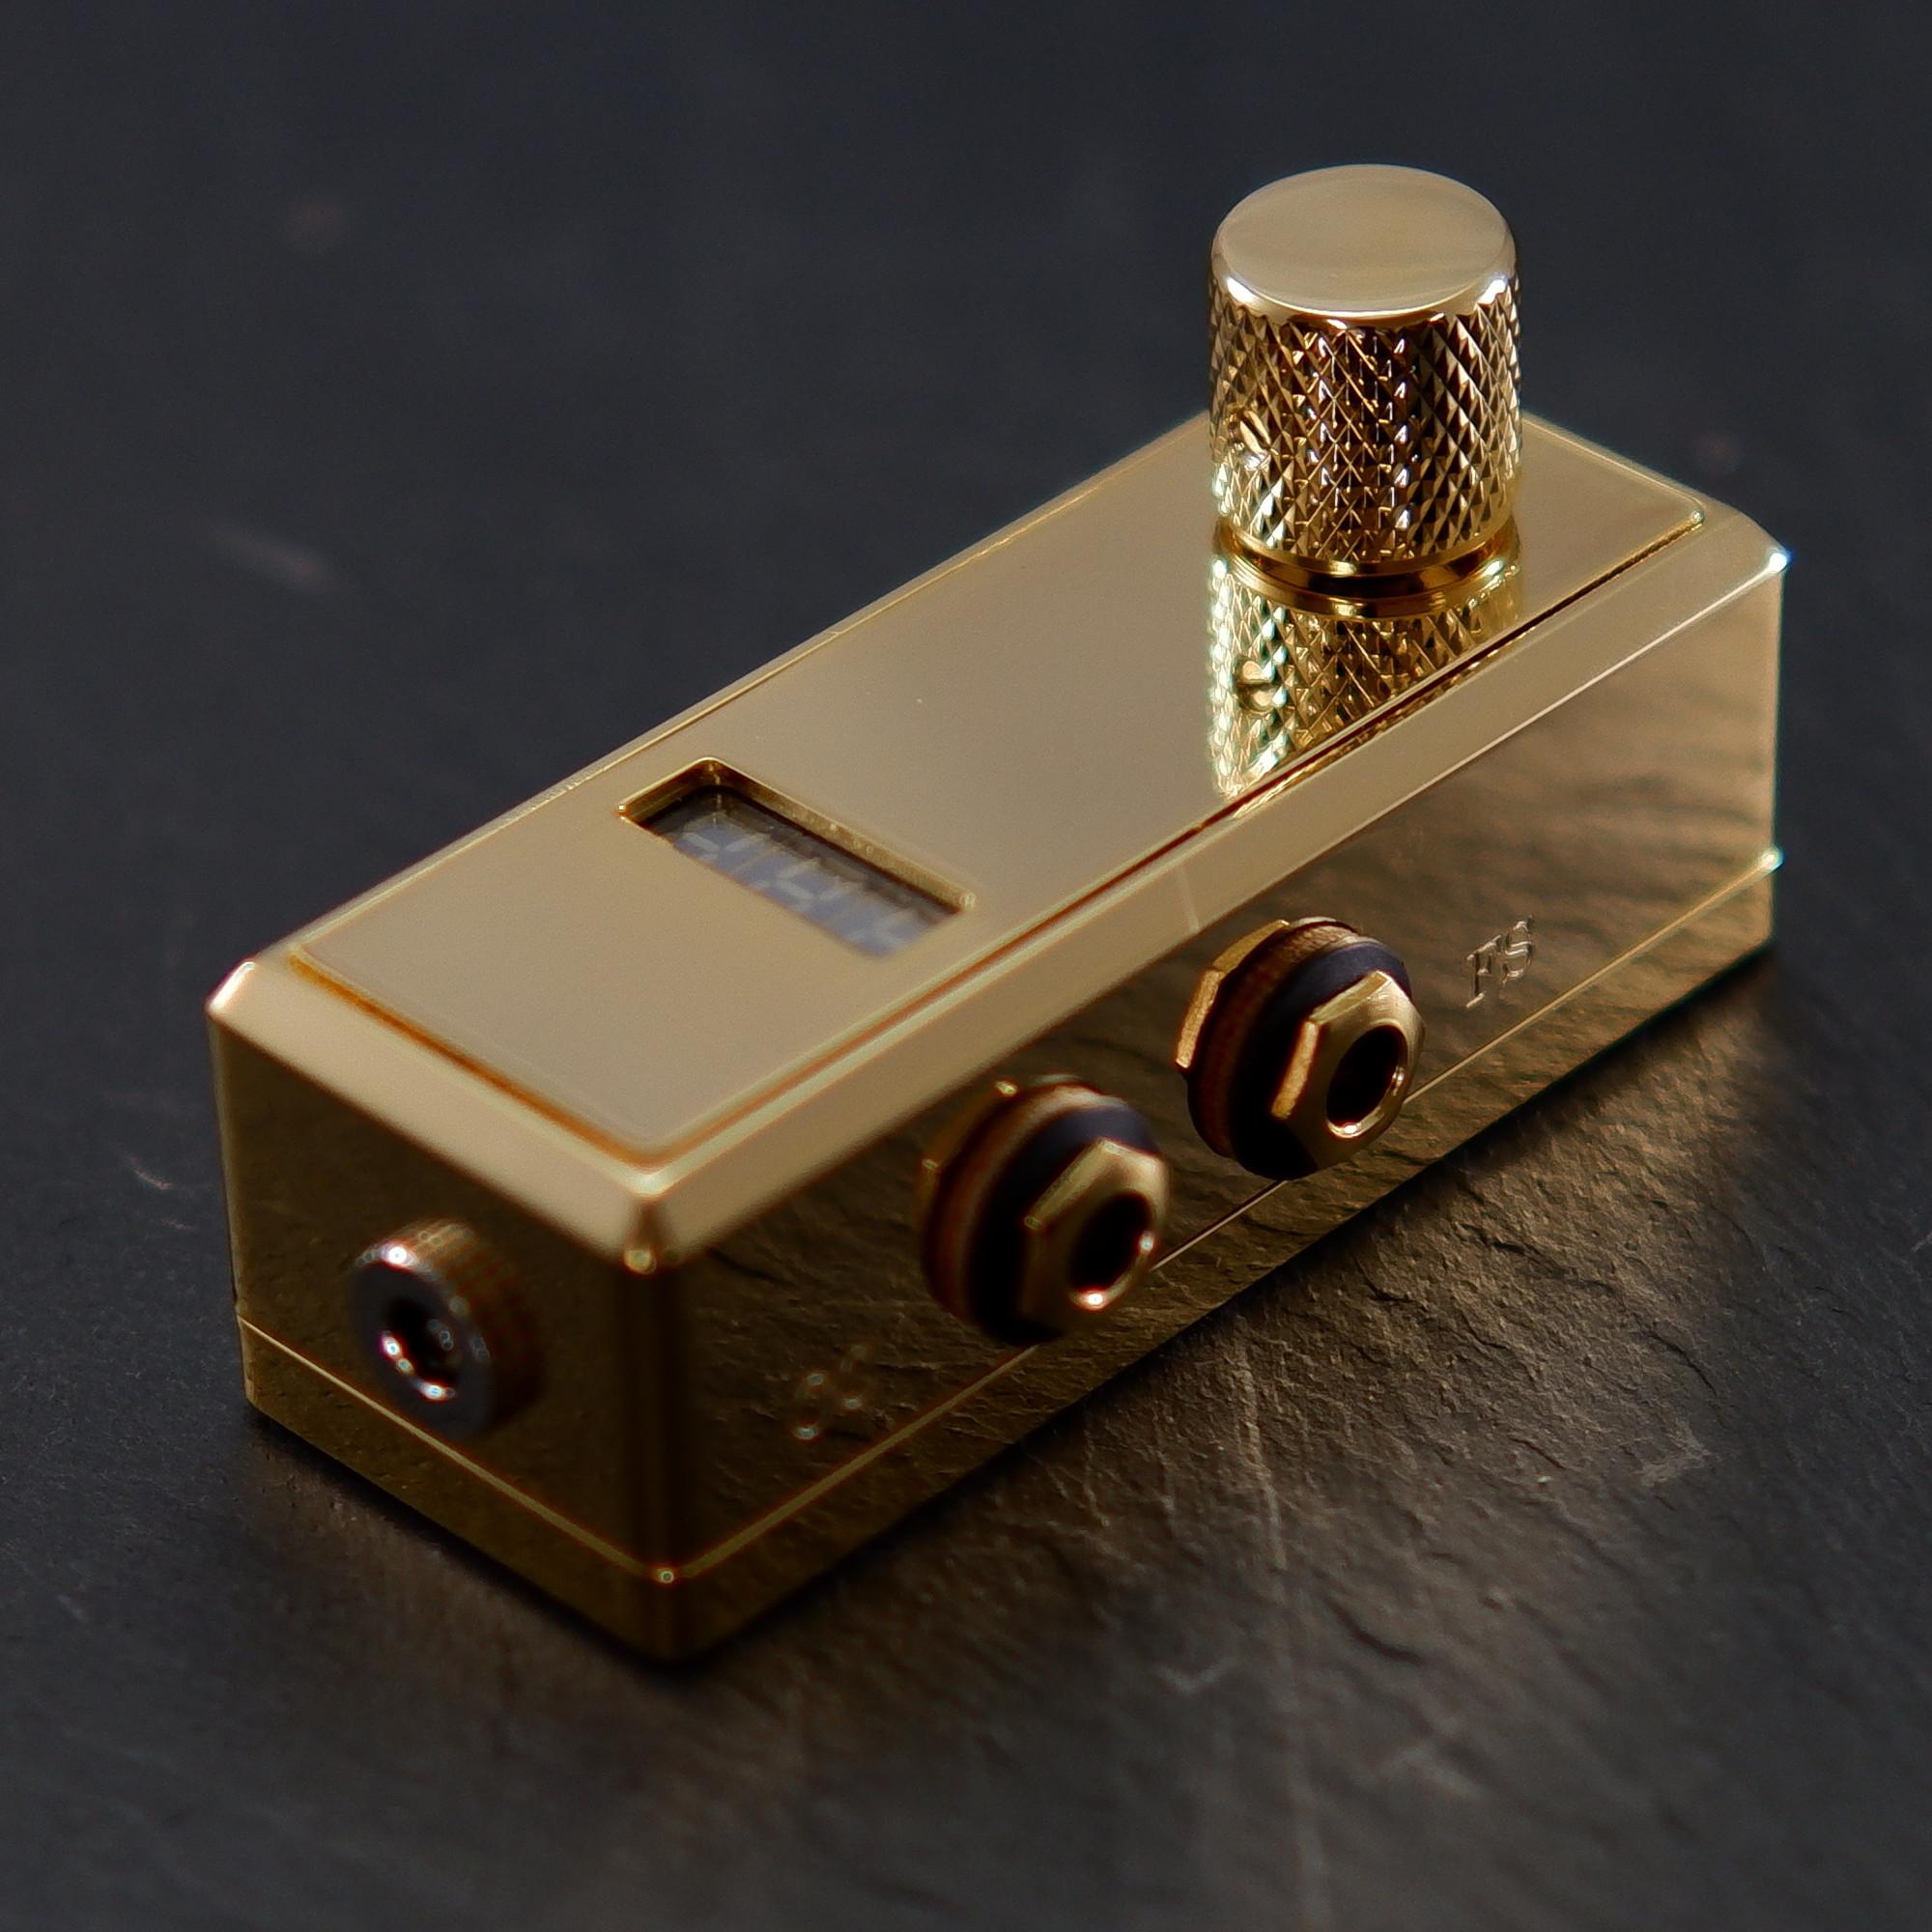 24Kgold plated DearConcubine CHPTR2